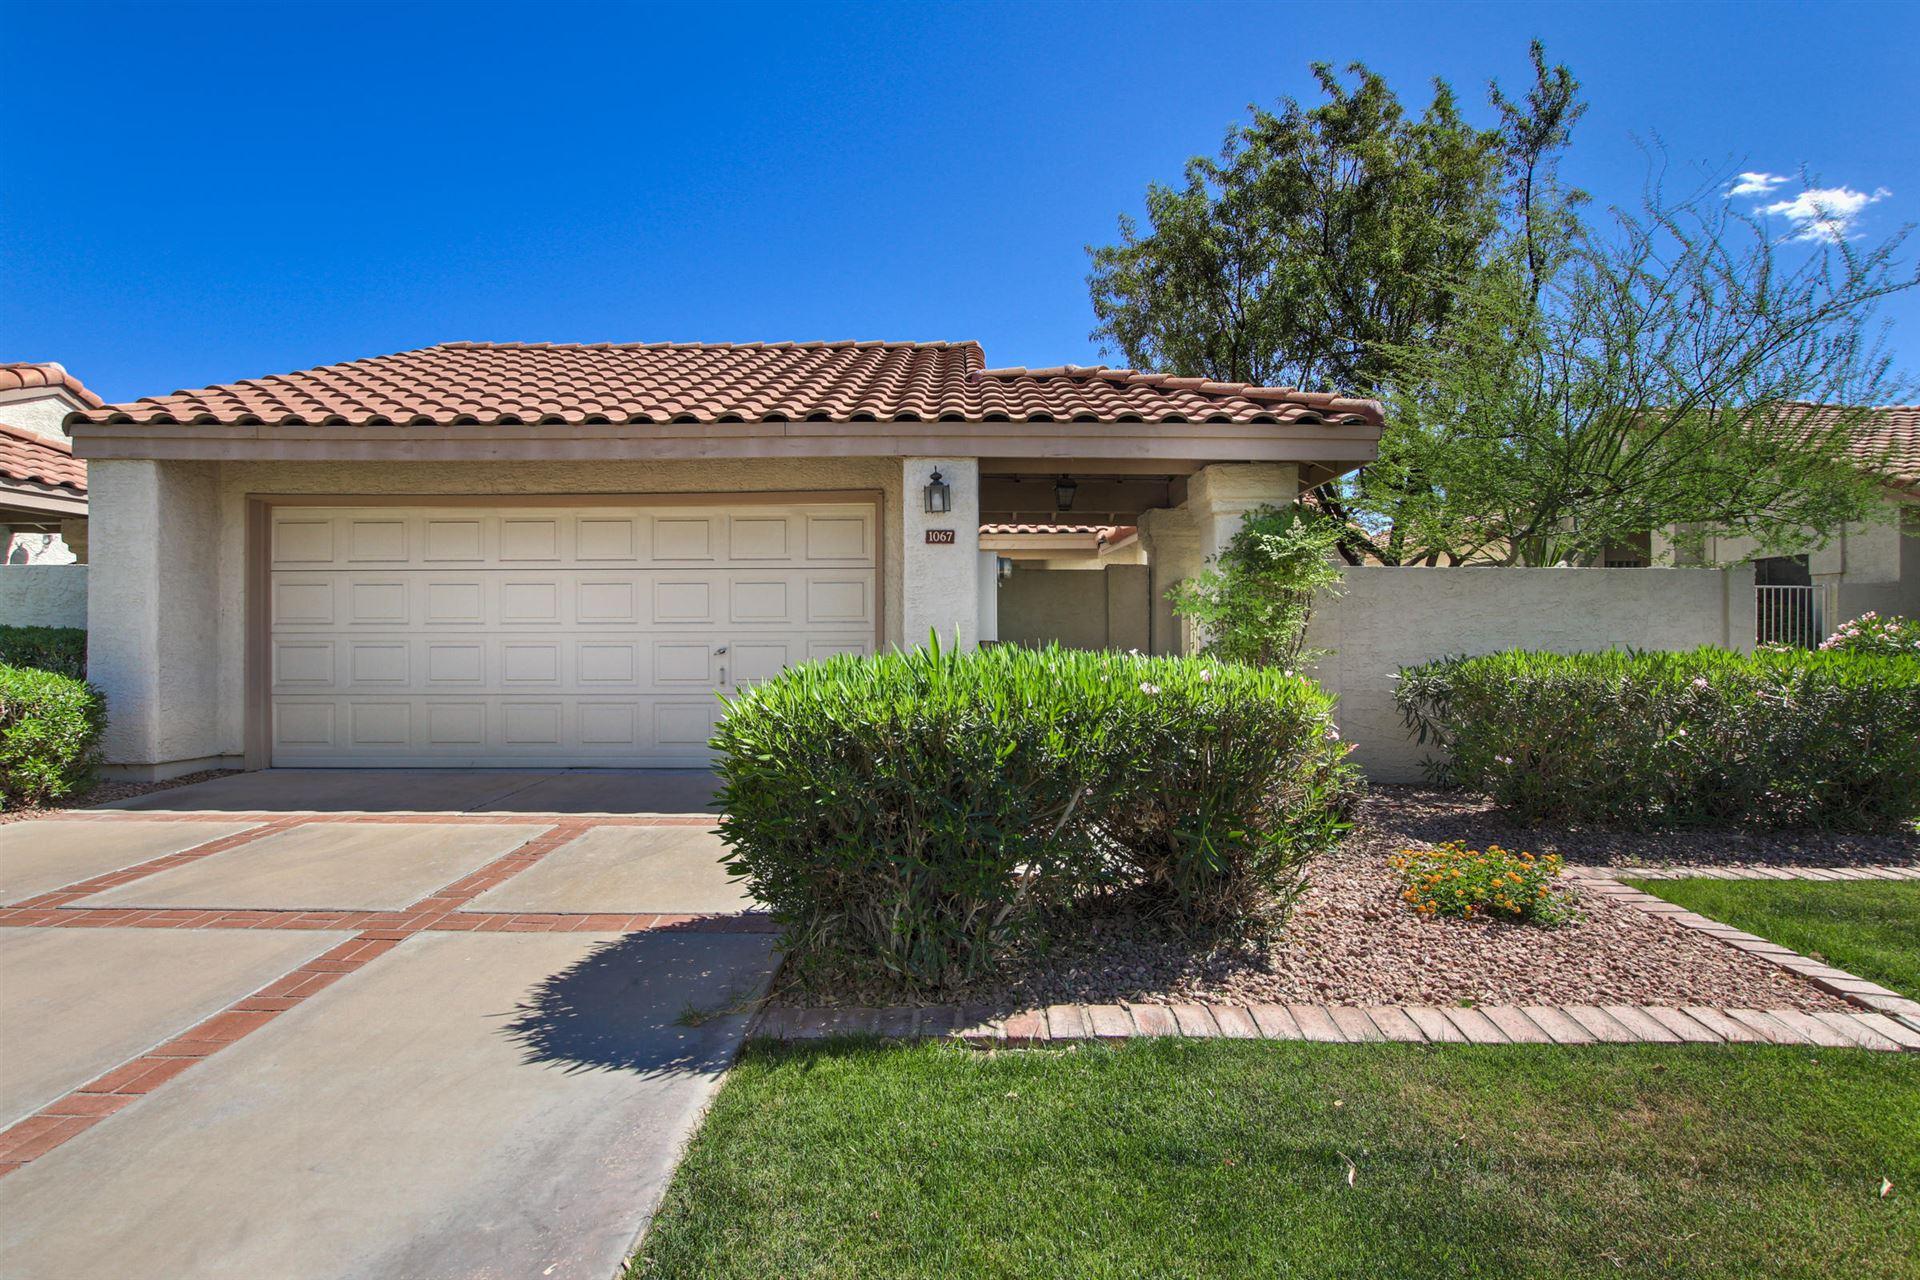 1067 E MCNAIR Drive, Tempe, AZ 85283 - MLS#: 6230932